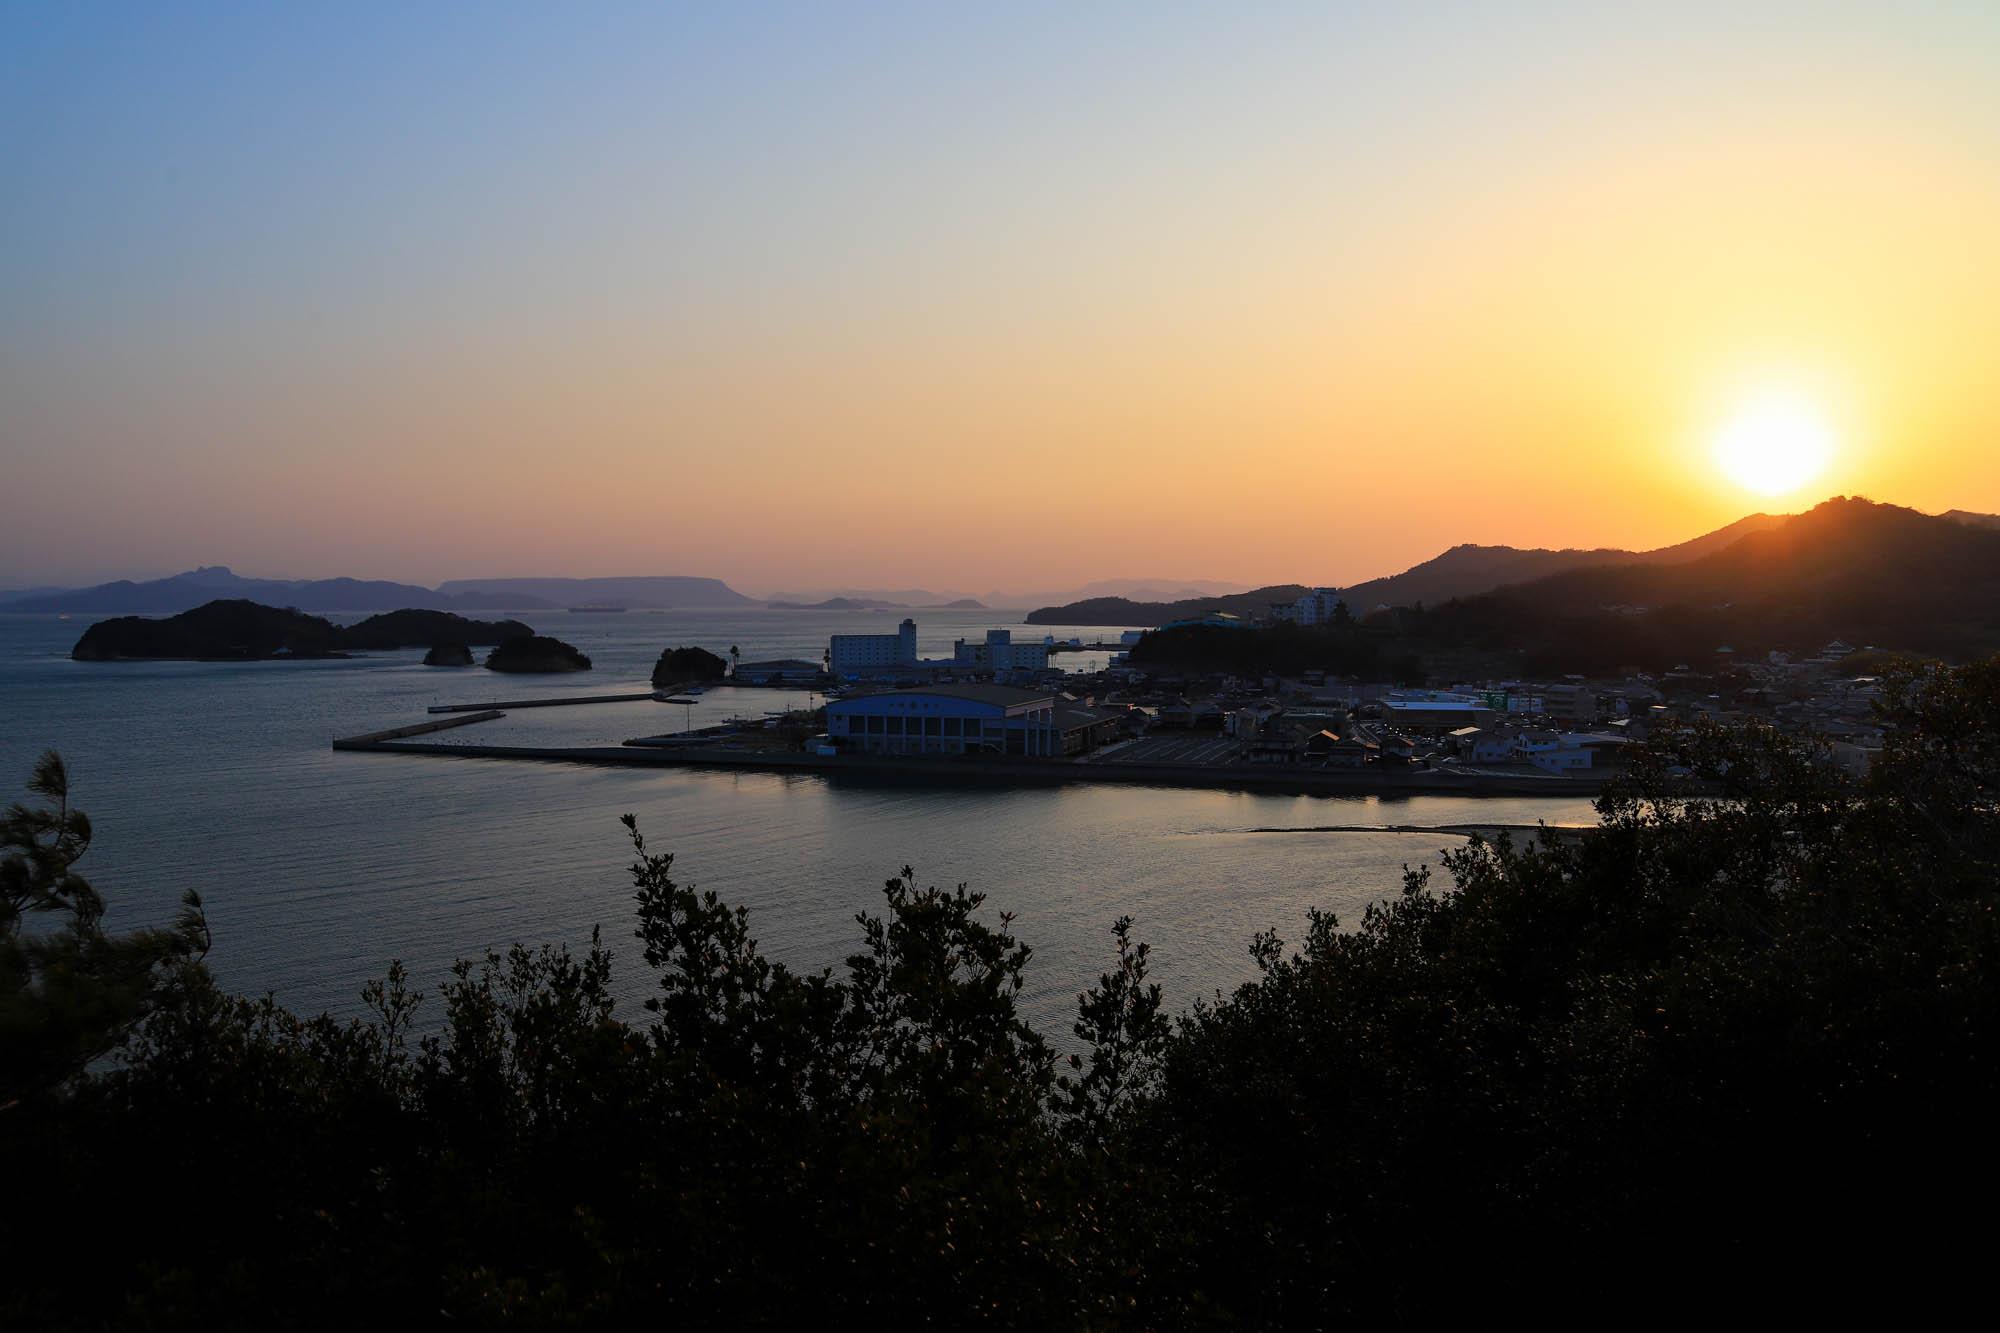 takagisan_ferry-16.jpg